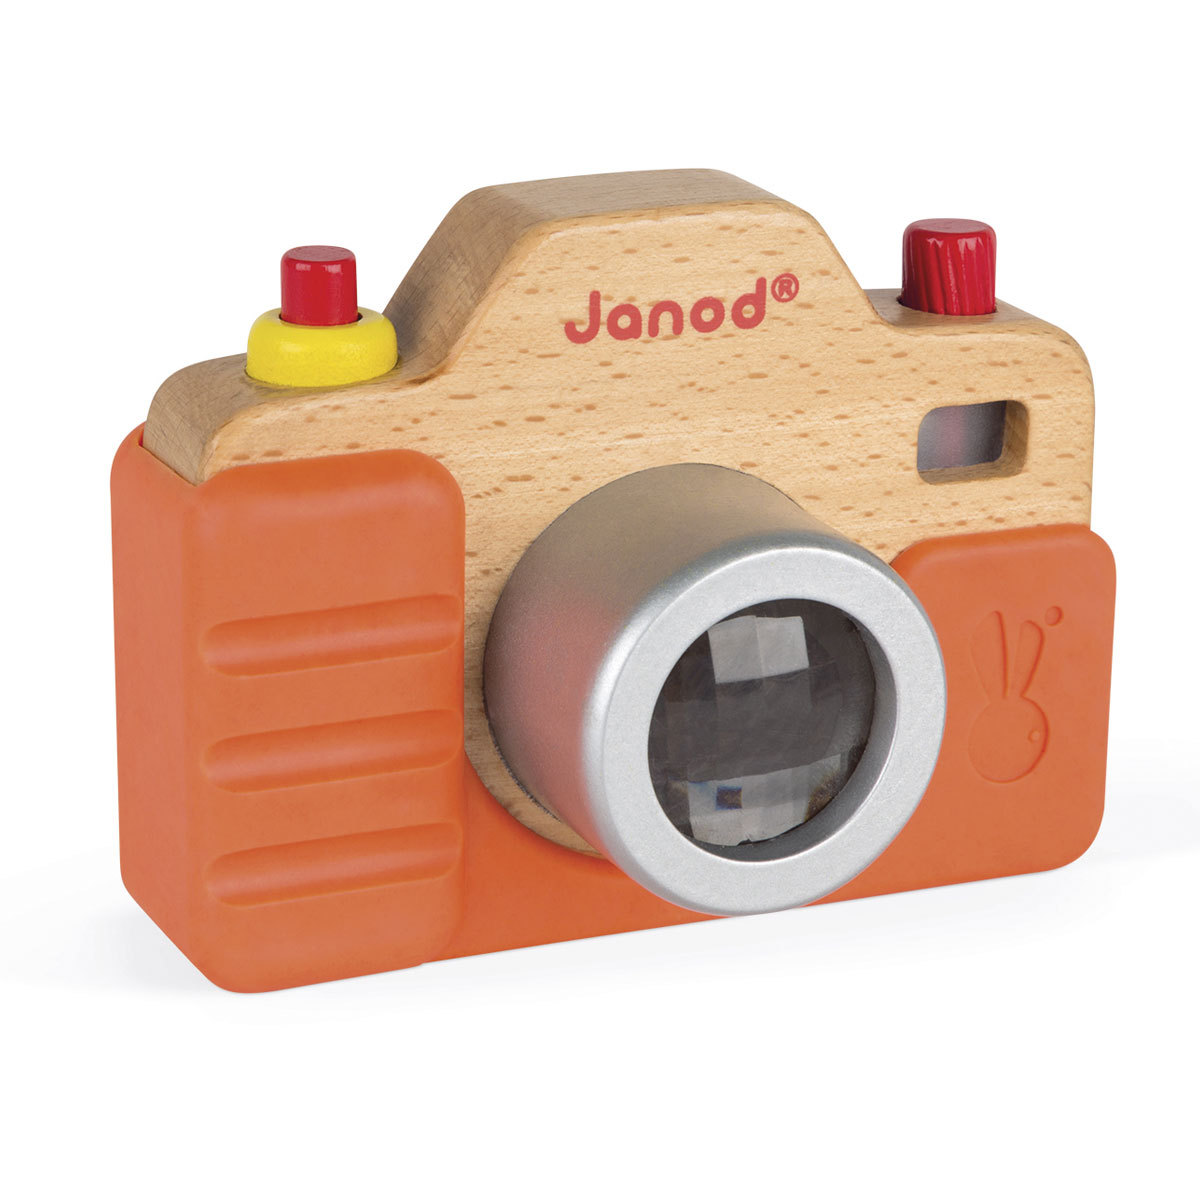 Mes premiers jouets Appareil Photo Sonore Appareil Photo Sonore